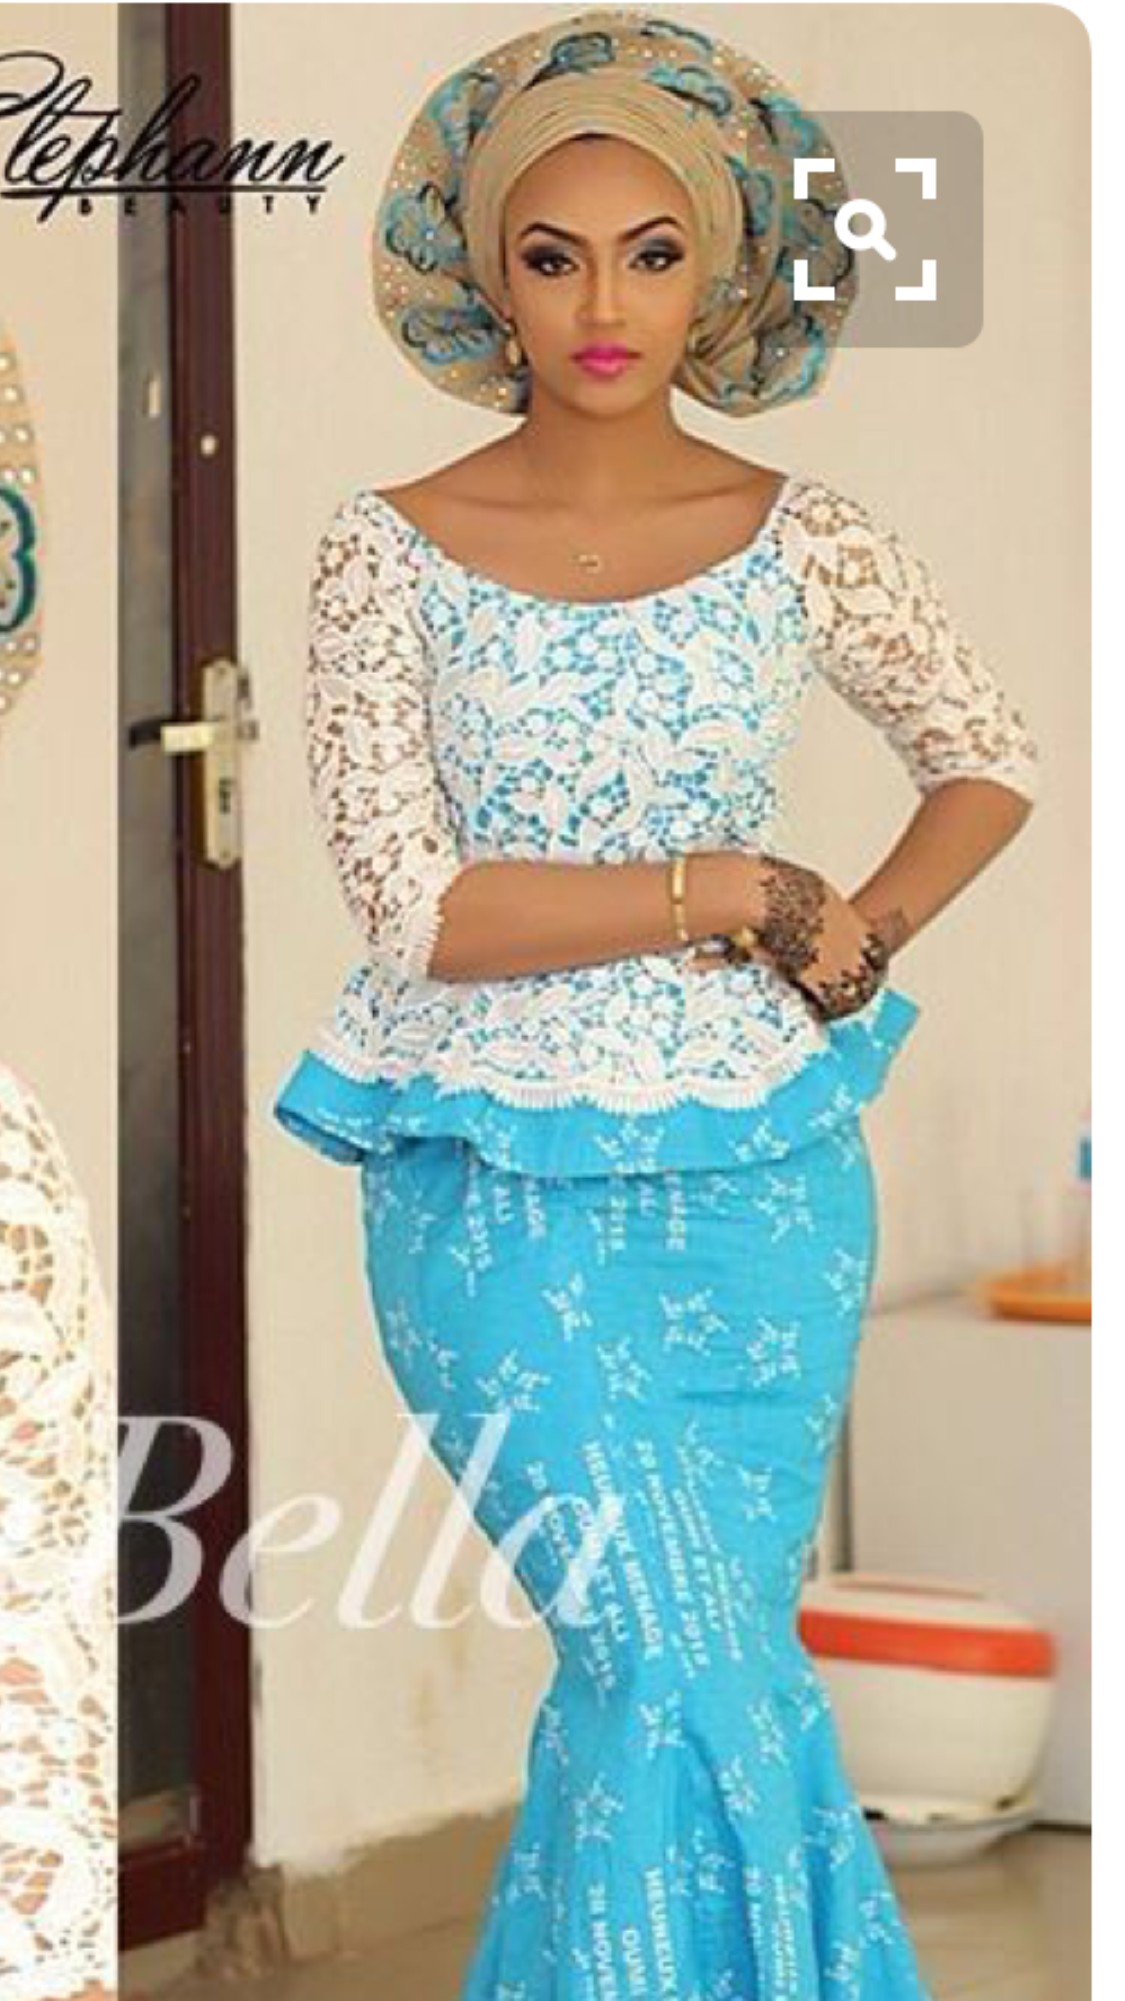 Dkk Latest African Fashion Ankara Kitenge African Women Dresses African Prints African Fashion Dresses African Dresses For Women African Fashion Women